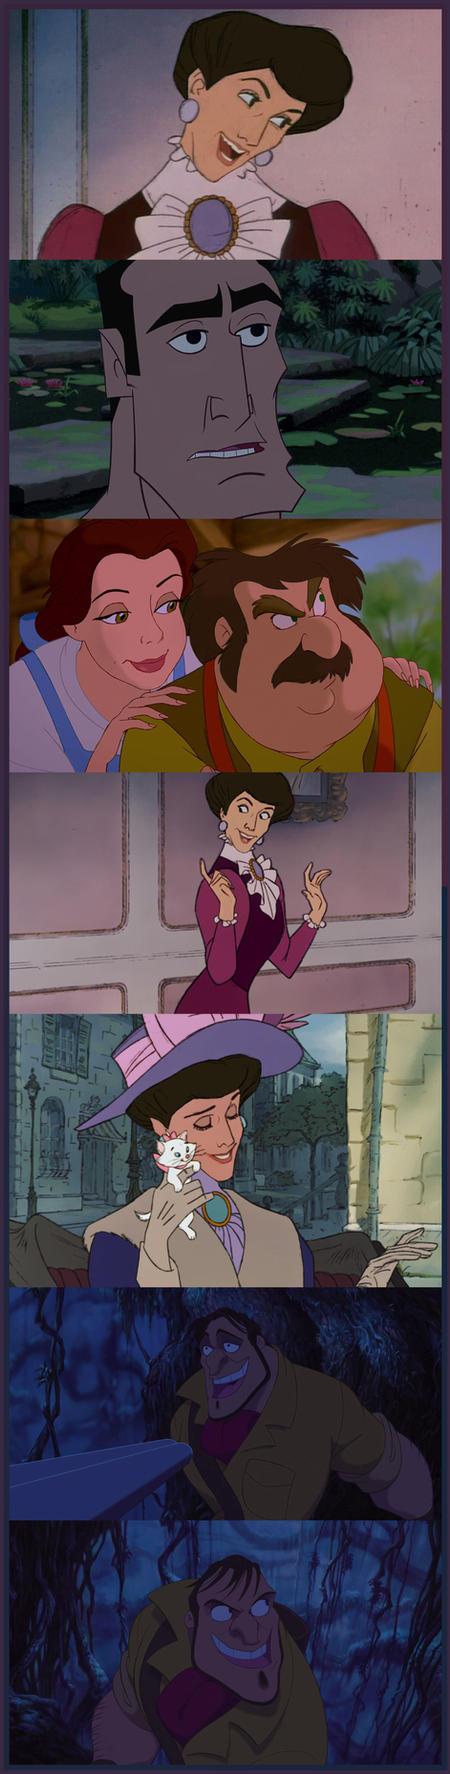 Disney character rejuvenation by pitchblack1994